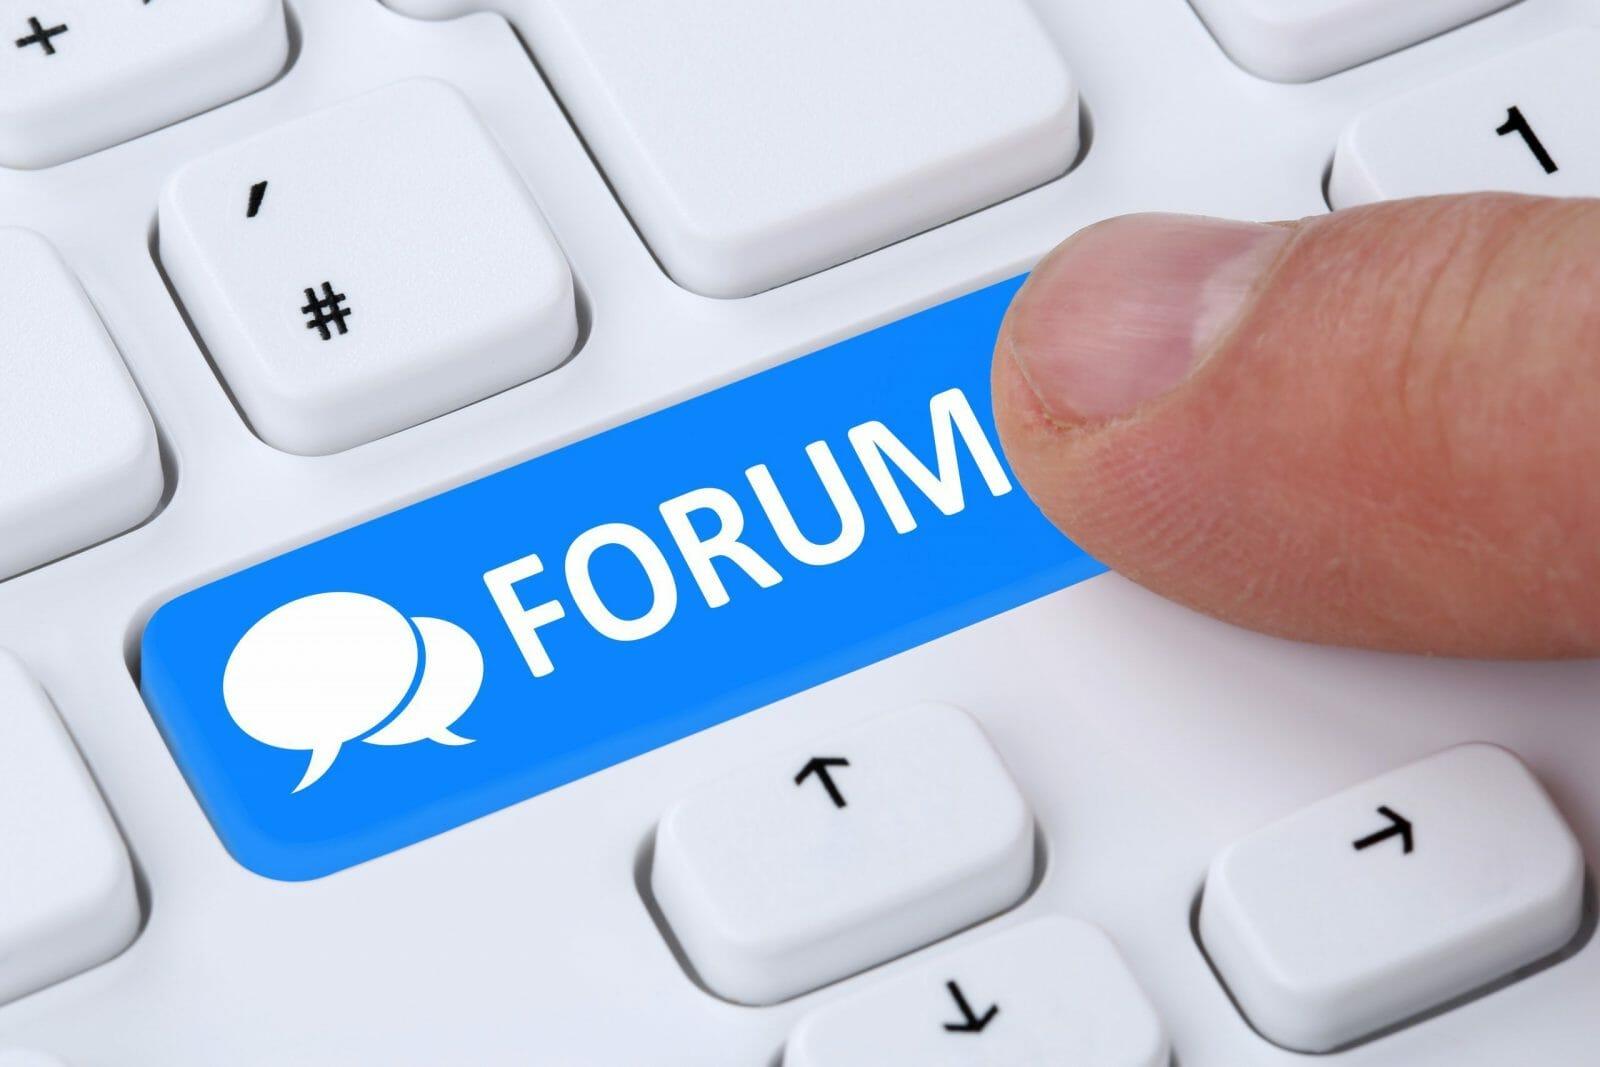 Forum communication community internet blog media discussion online computer keyboard concept